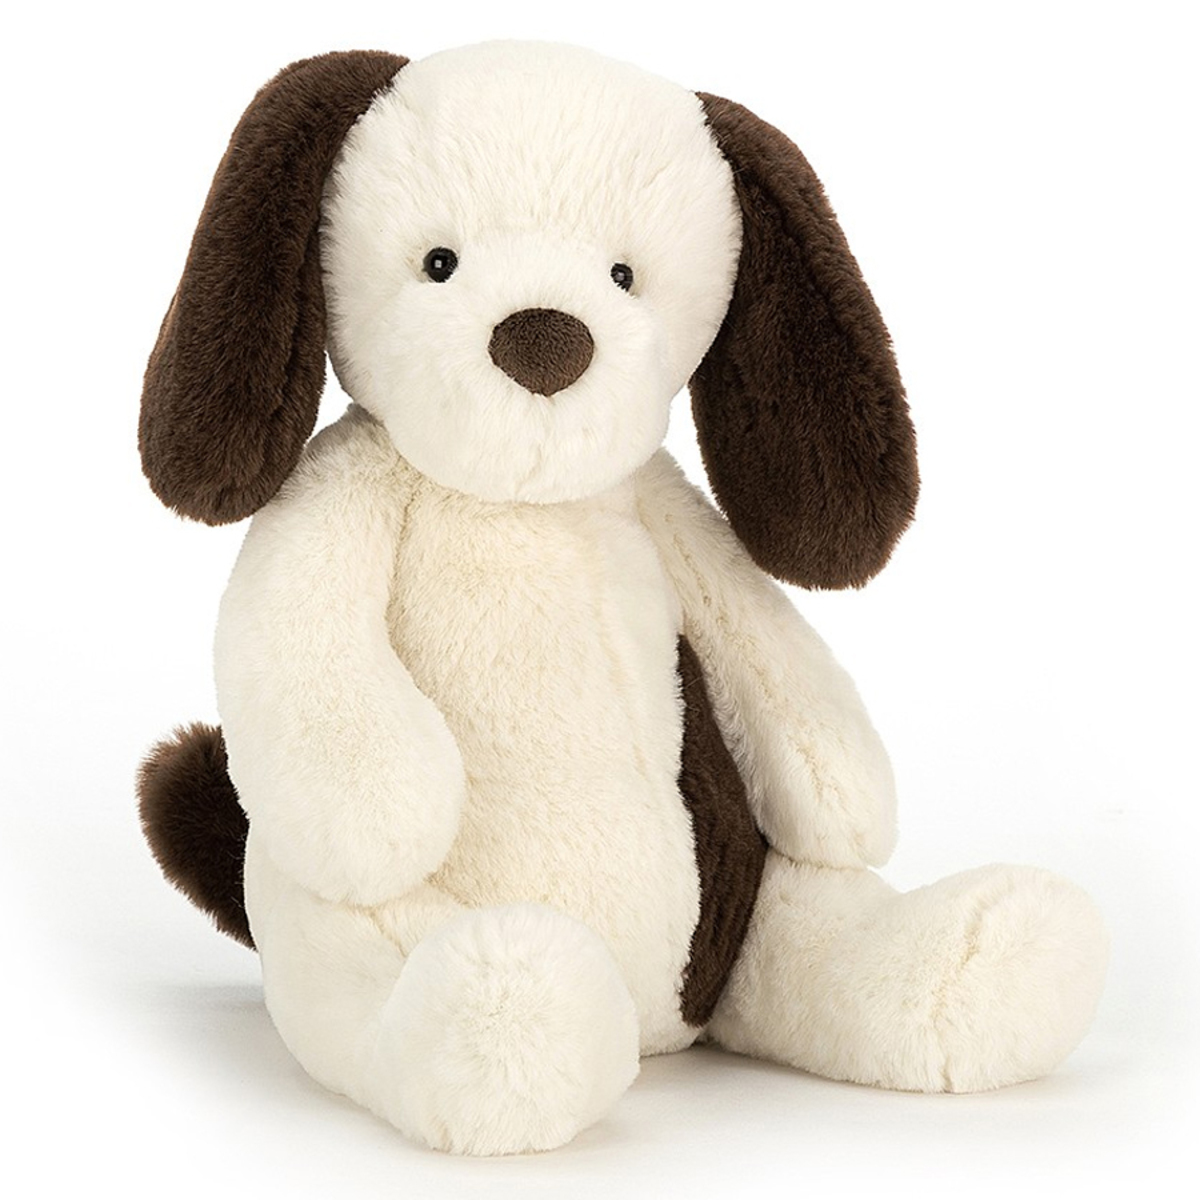 Peluche Puffles Puppy - Medium